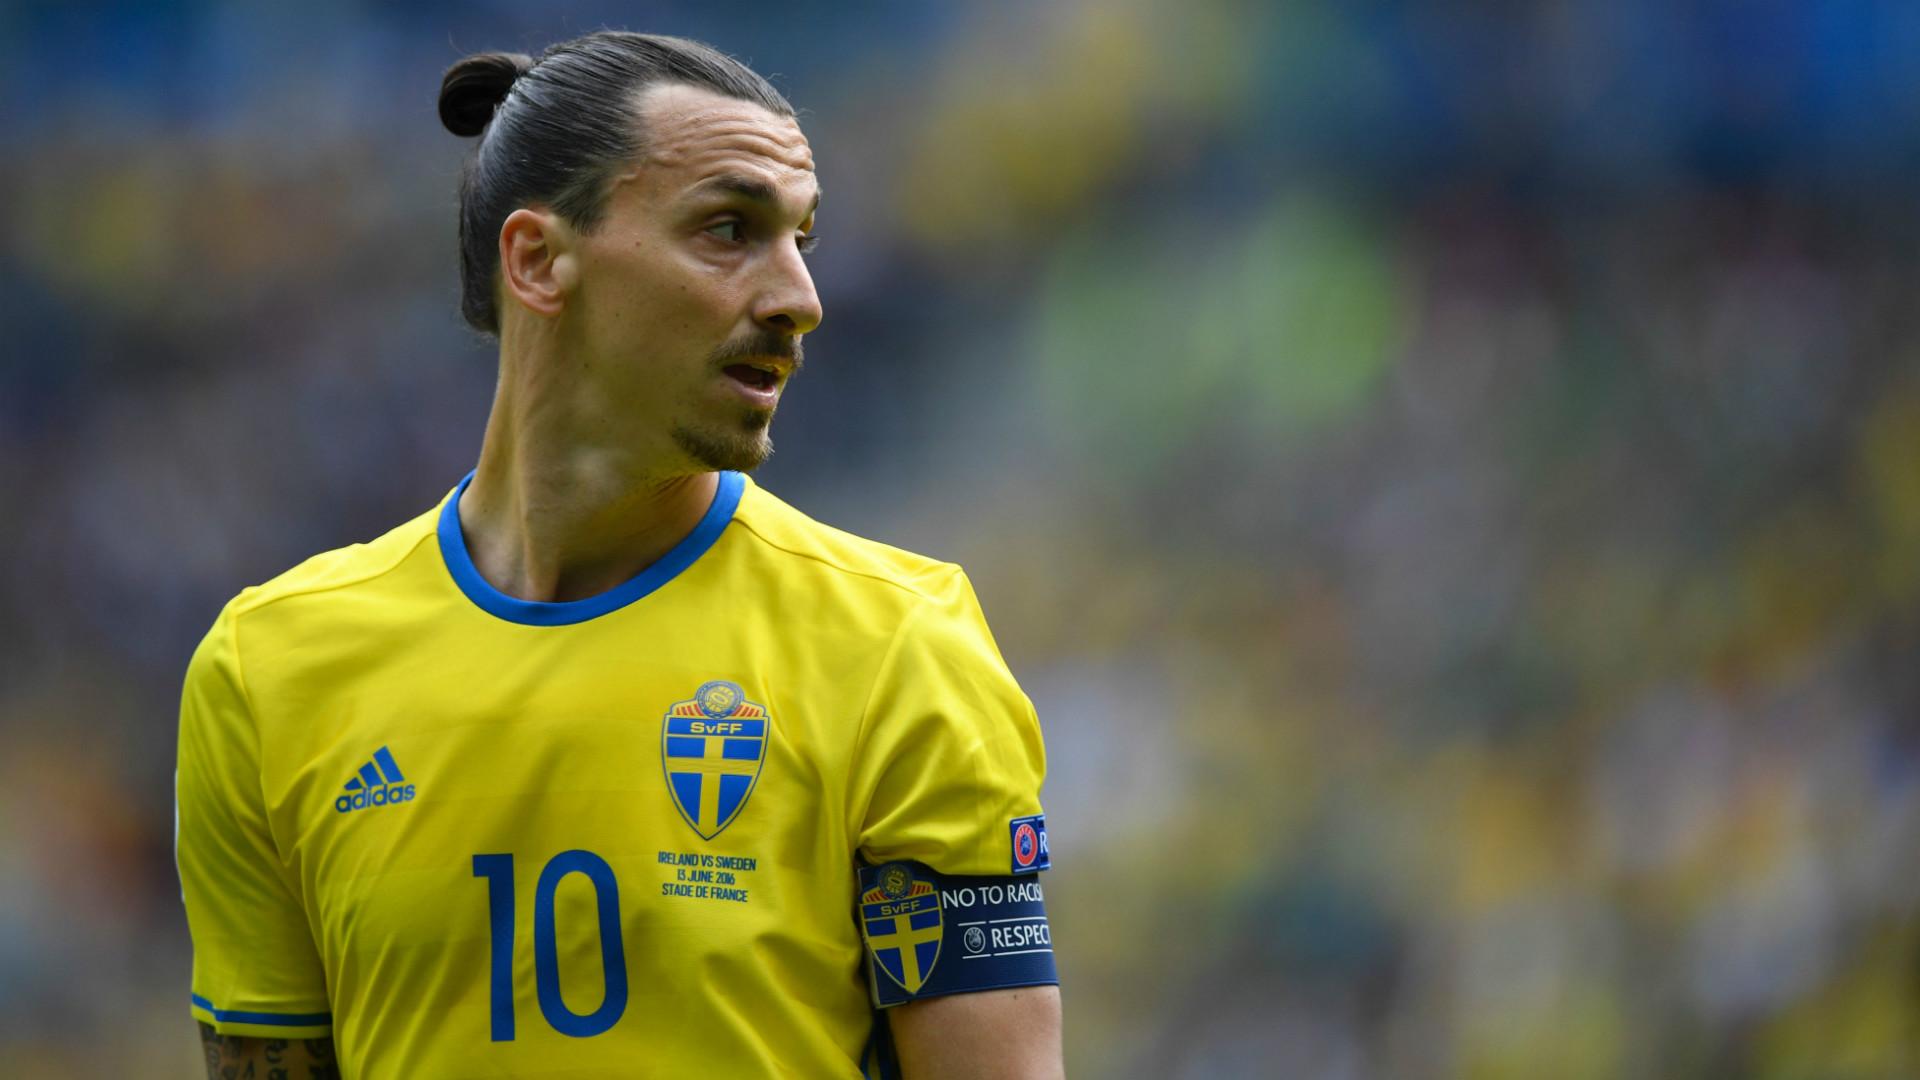 Image result for Ibrahimovic sweden